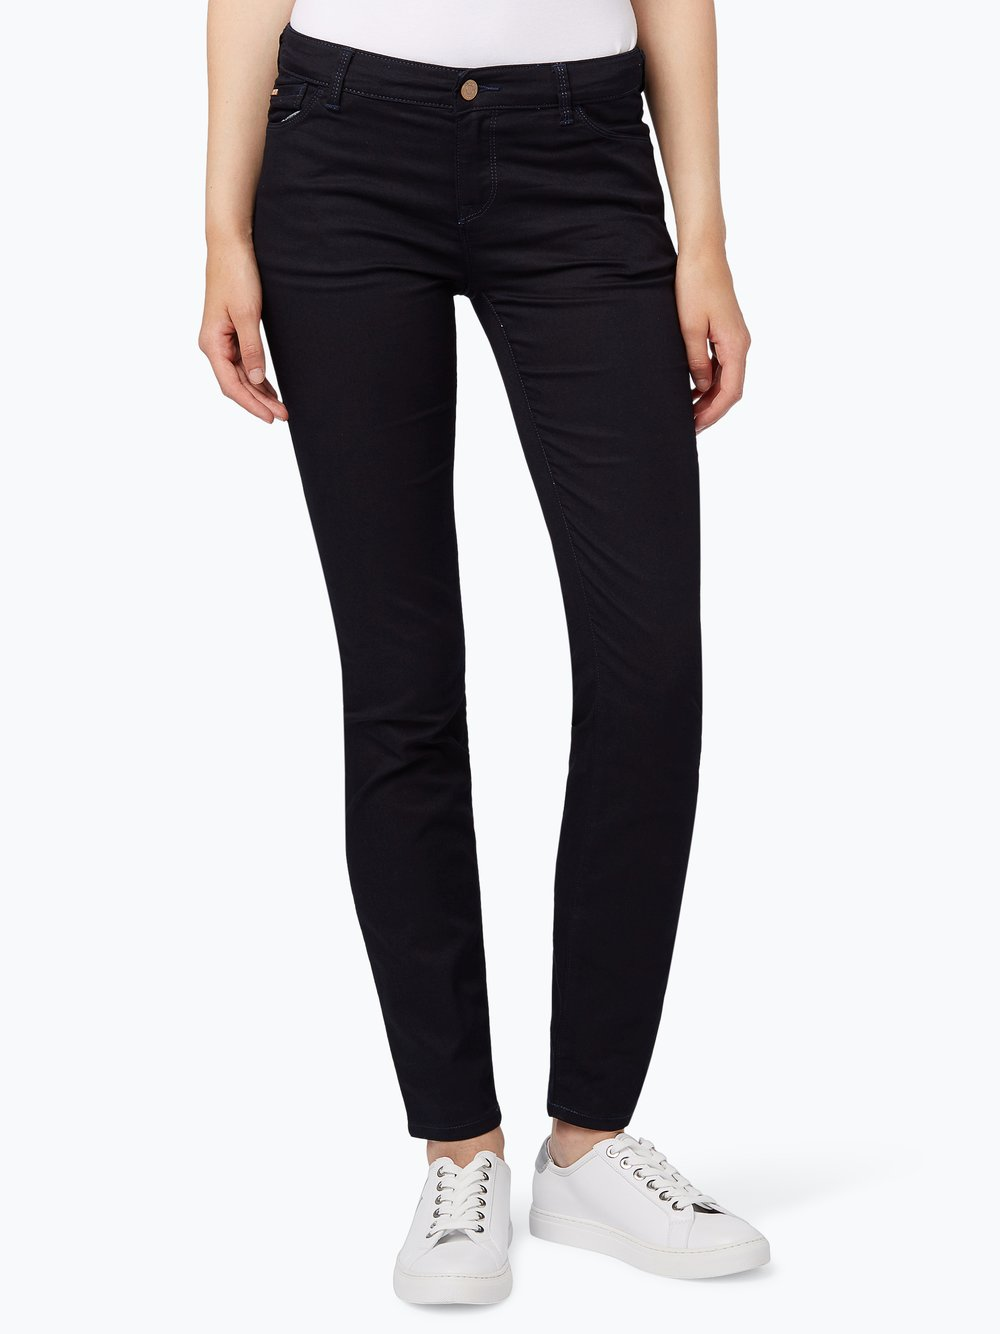 Peek und cloppenburg armani jeans damen